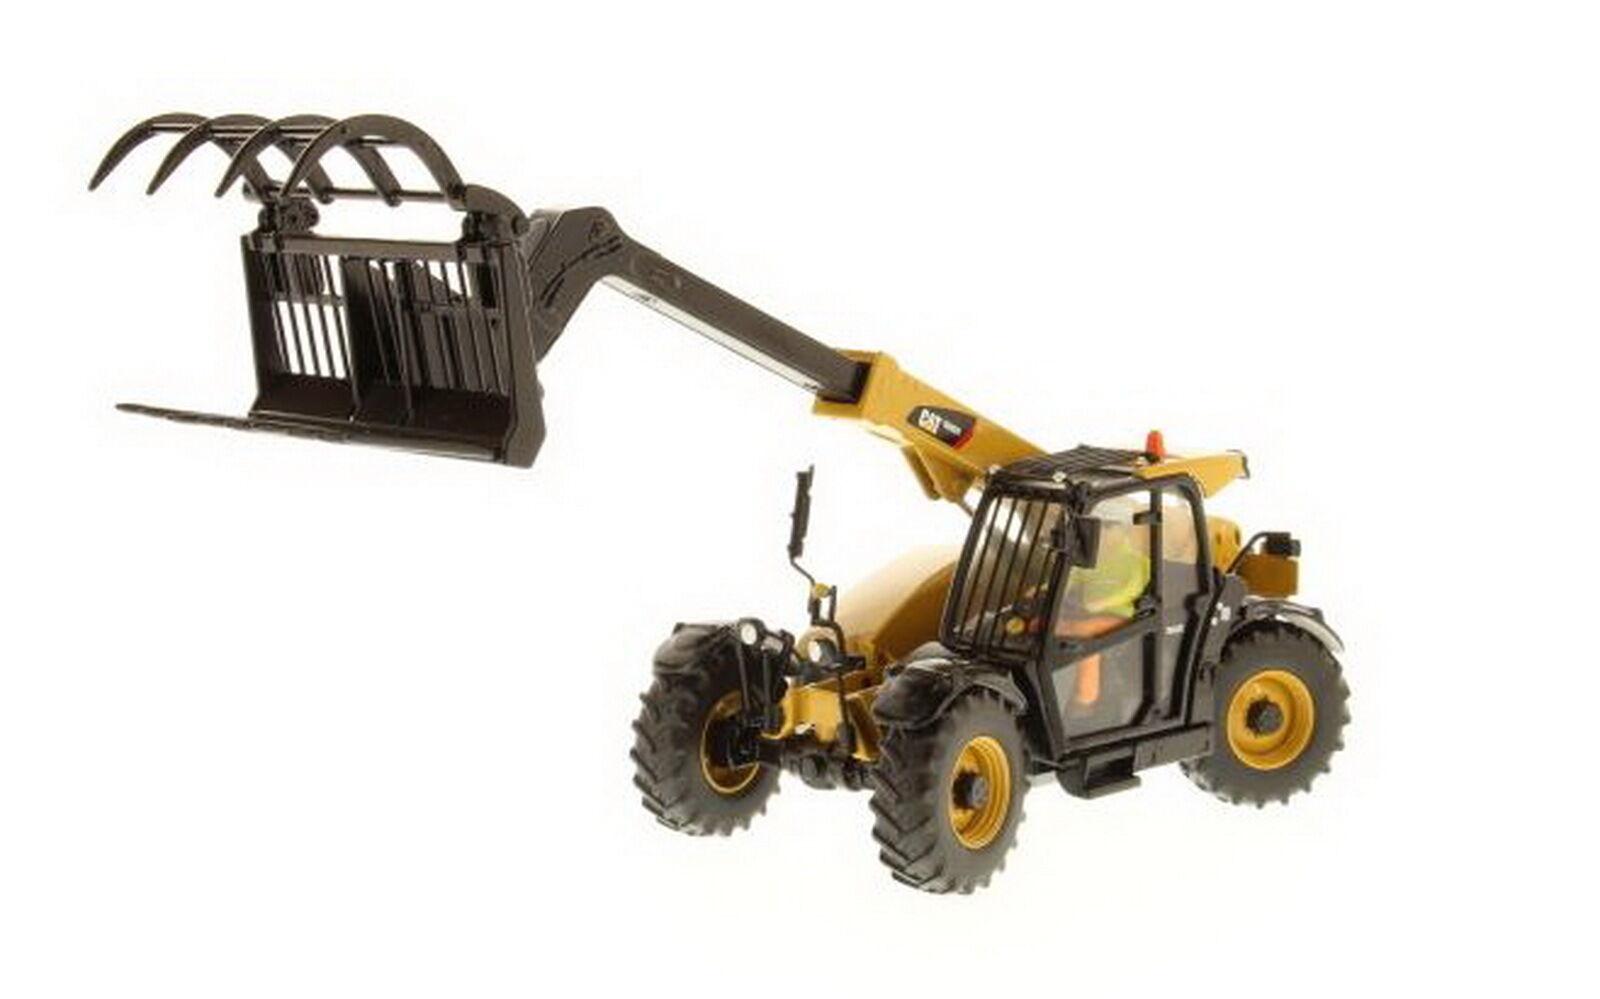 1 32 DM Caterpillar Cat TH407C Telehandler Diecast Model